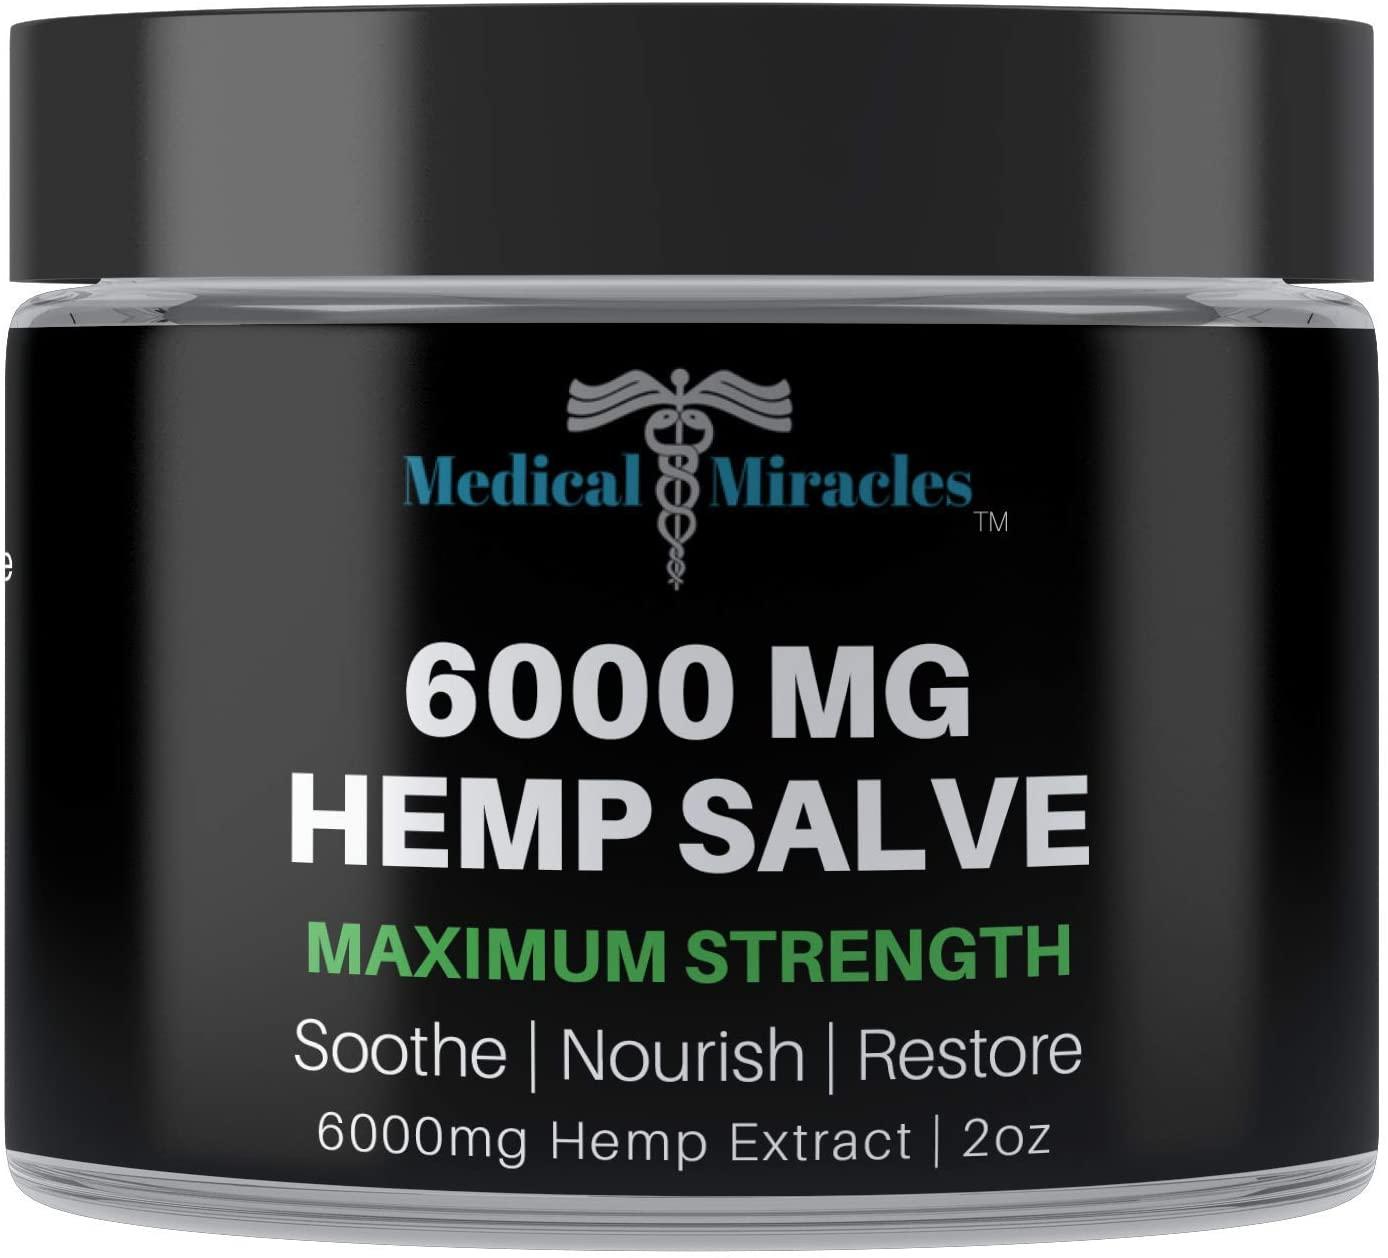 Medical Miracles 6000 MG Hemp Salve